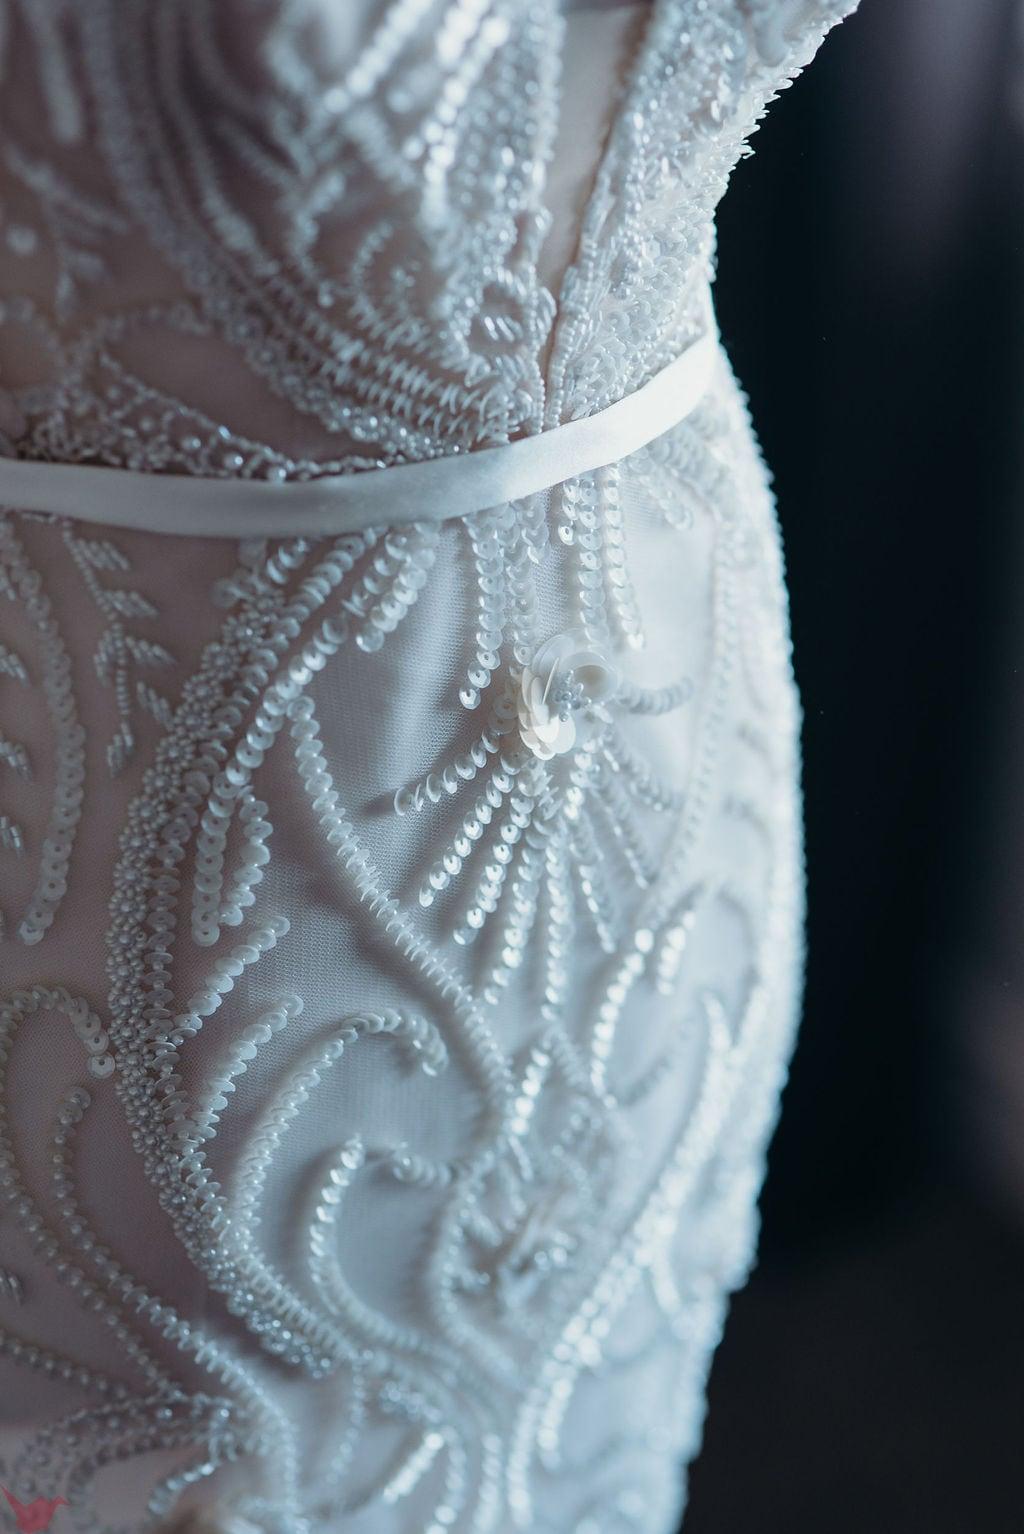 james-felicia-papercrane-wedding-photography-19.jpg